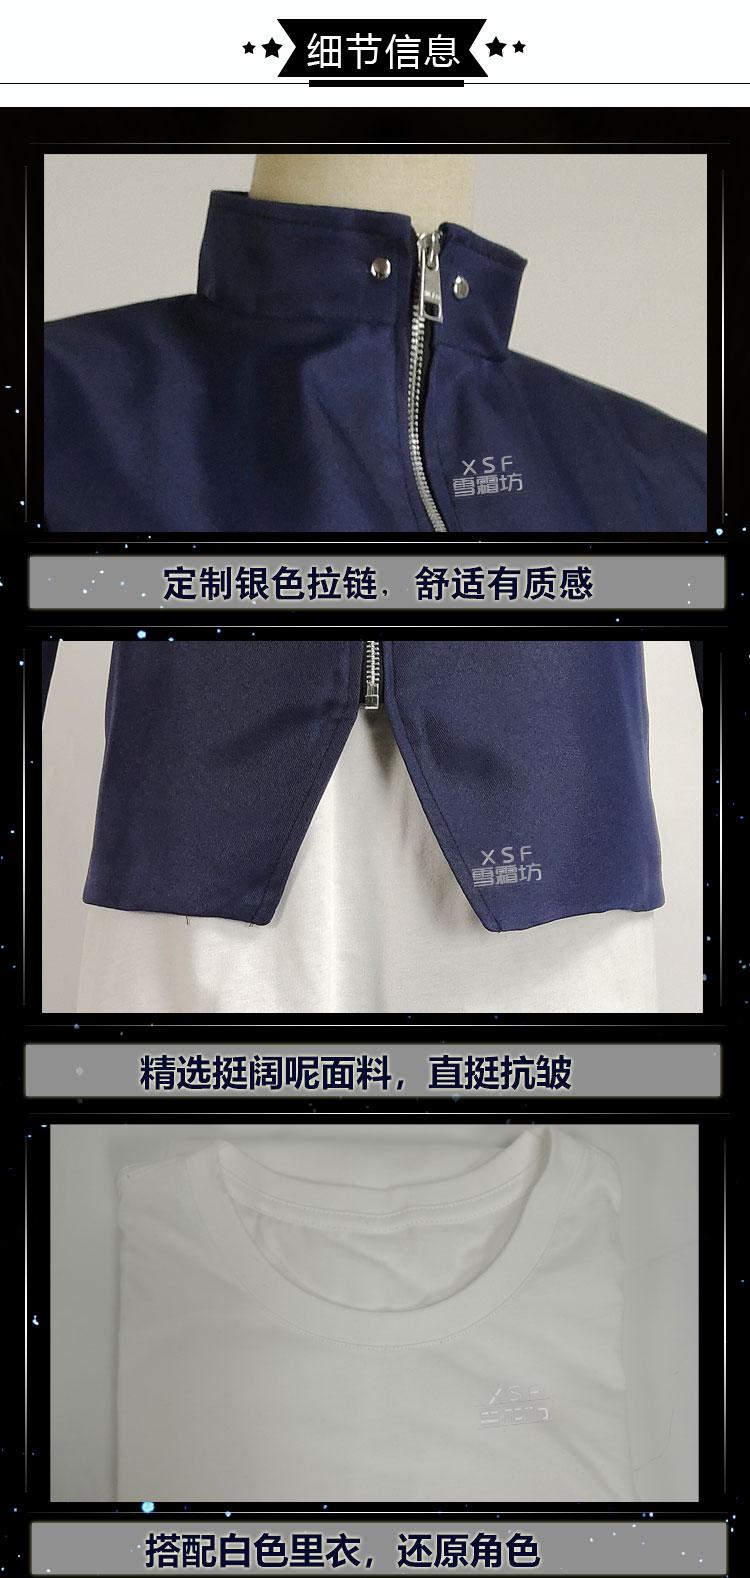 H9d1a70c52fe2406c81f3ead725ad10f4K - Jujutsu Kaisen Shop